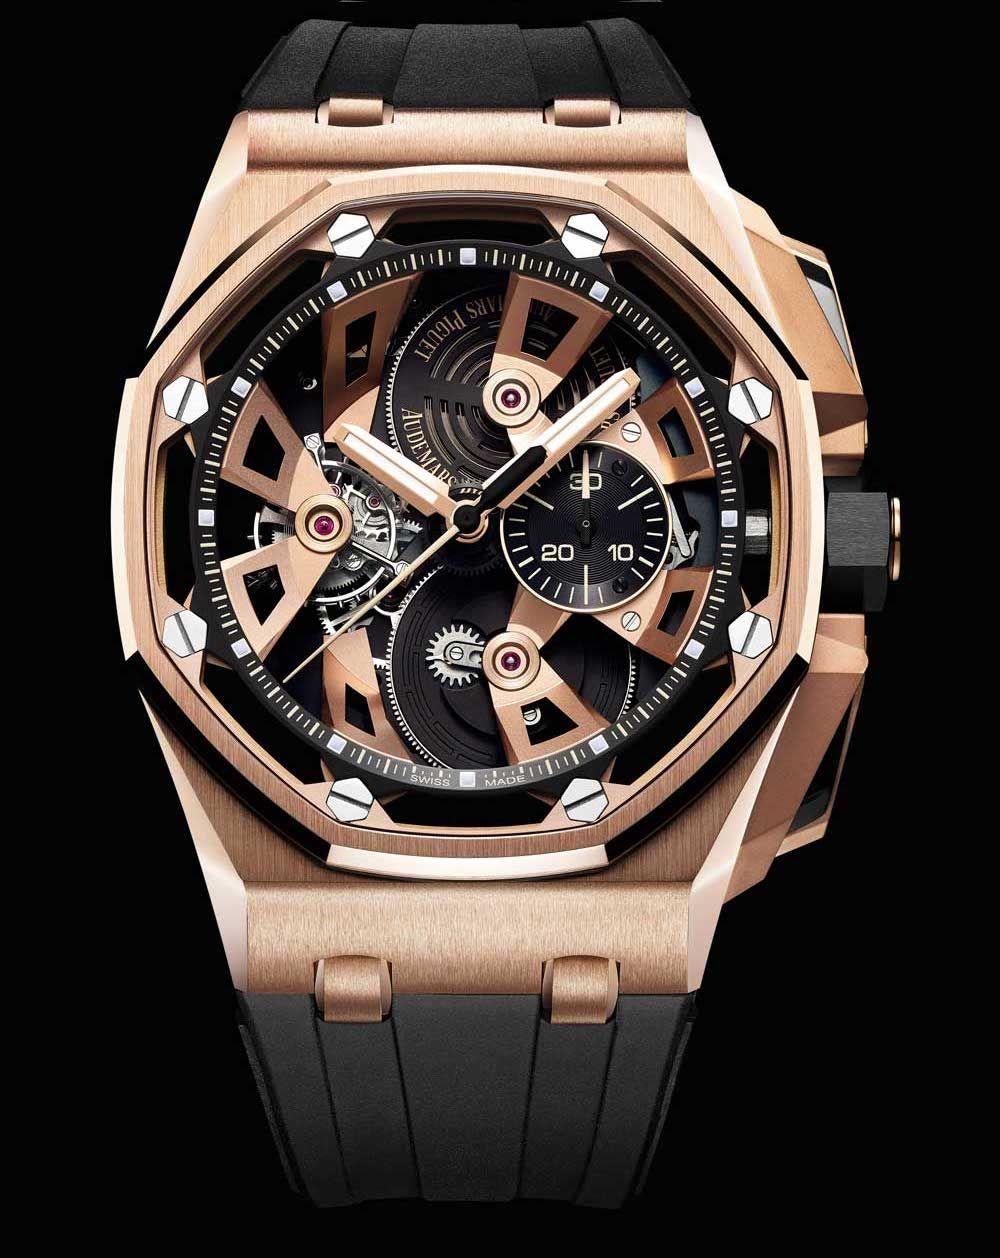 4055d83dd6b Audemars Piguet Royal Oak Offshore Tourbillon Chronograph 25th Anniversary  Watches